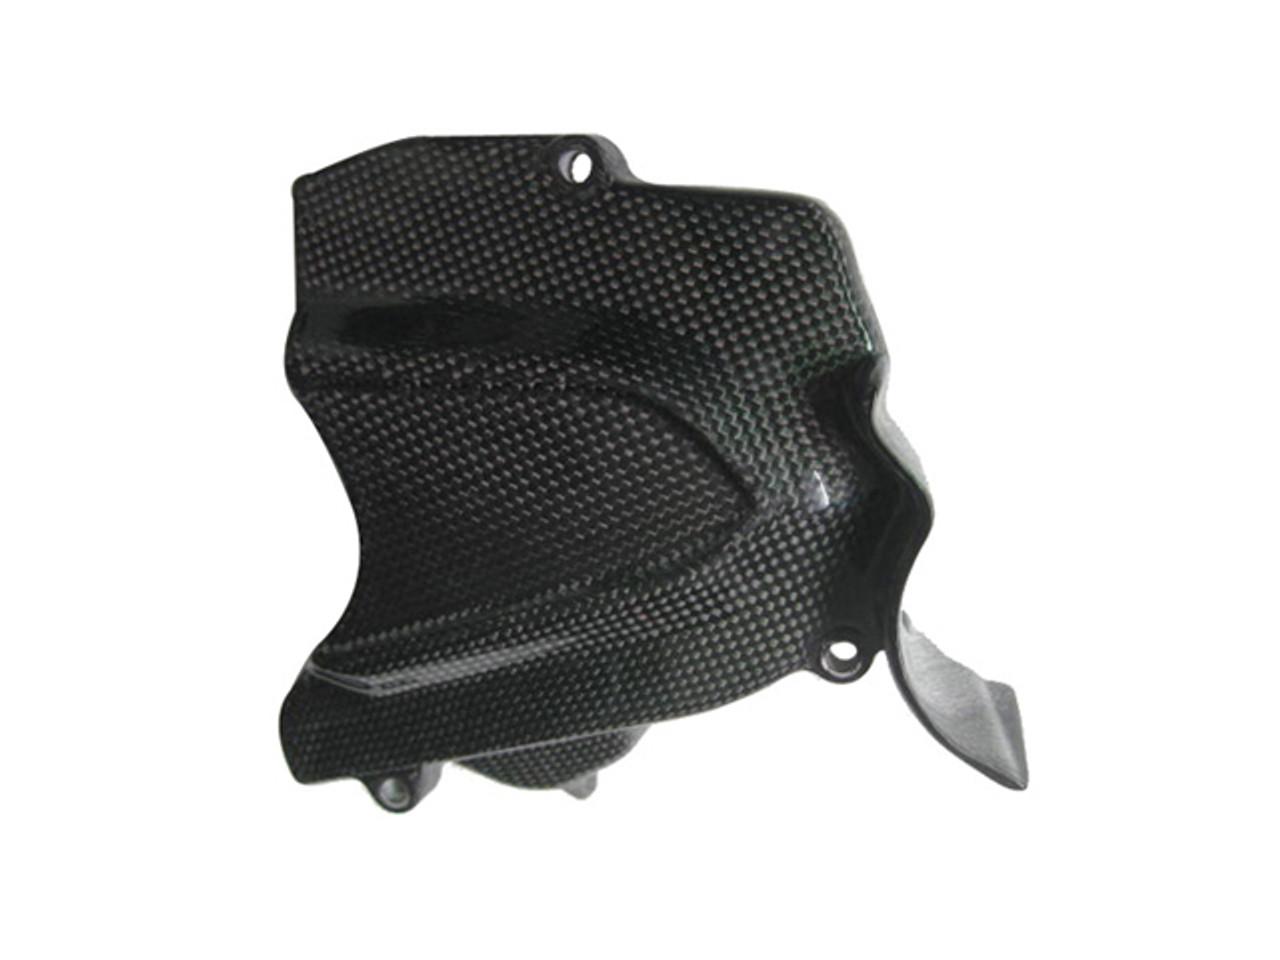 Glossy Plain Weave Carbon Fiber Sprocket Cover for MV Agusta F3 & Brutale 675/800, Dragster &  Rivale 800